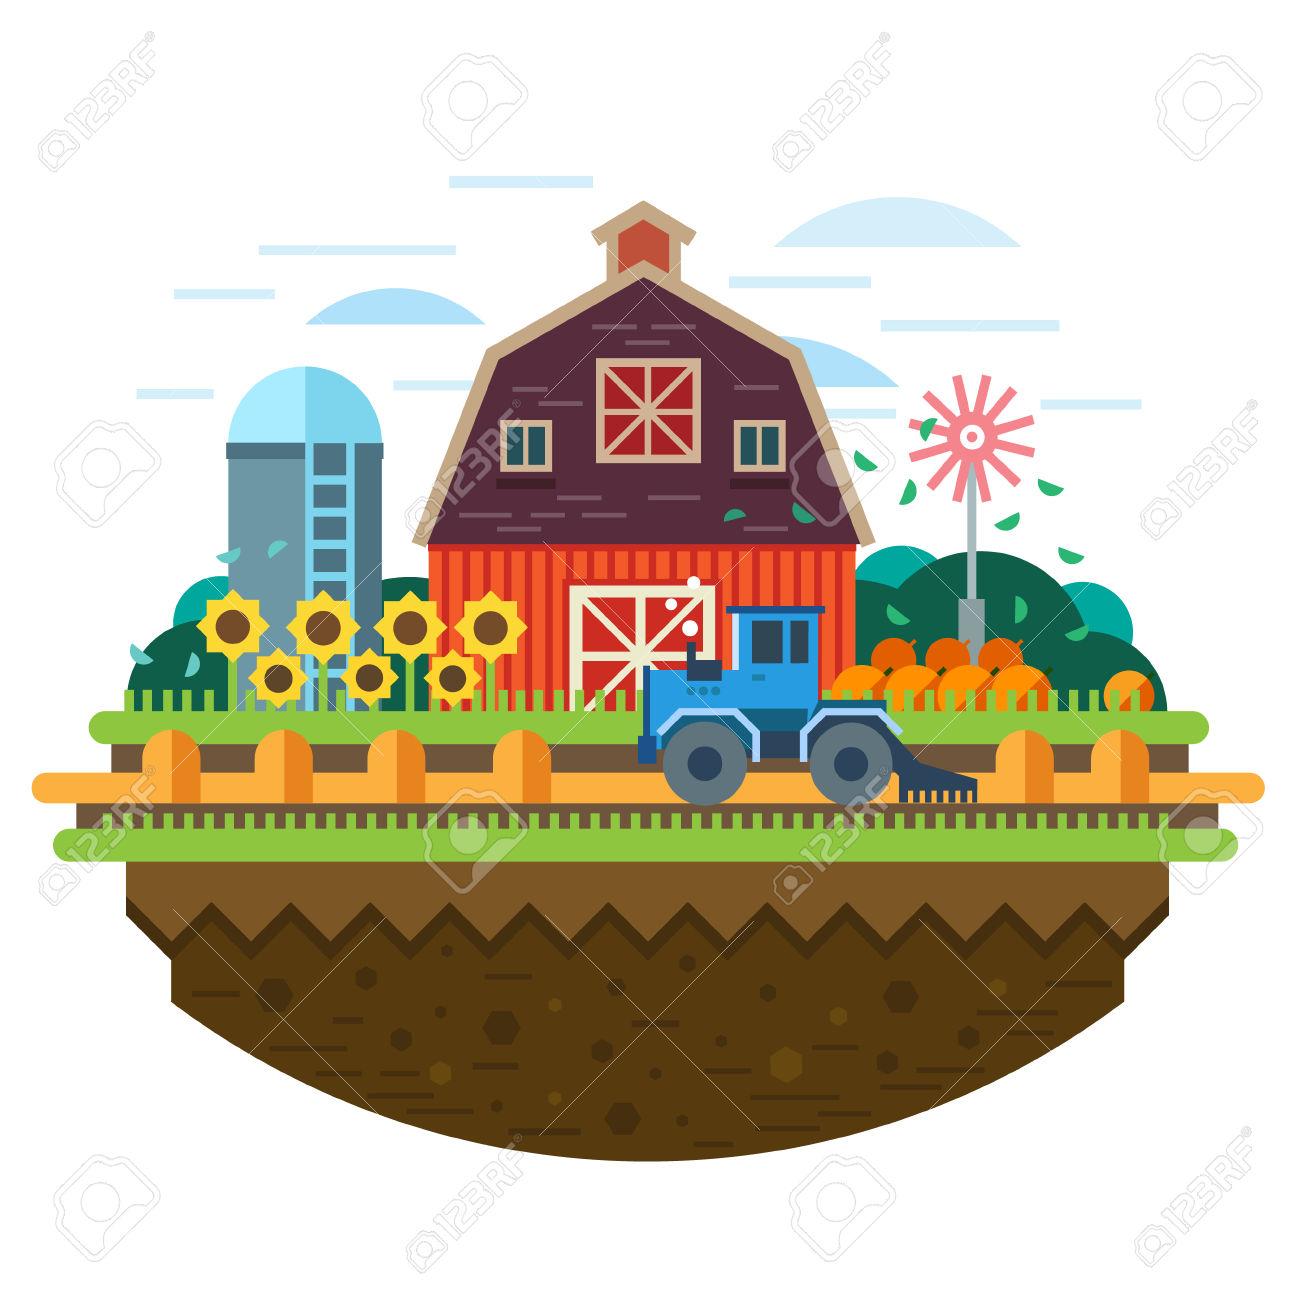 Farm Landscape. Agriculture Crop Field Hay Harvester. Vector.